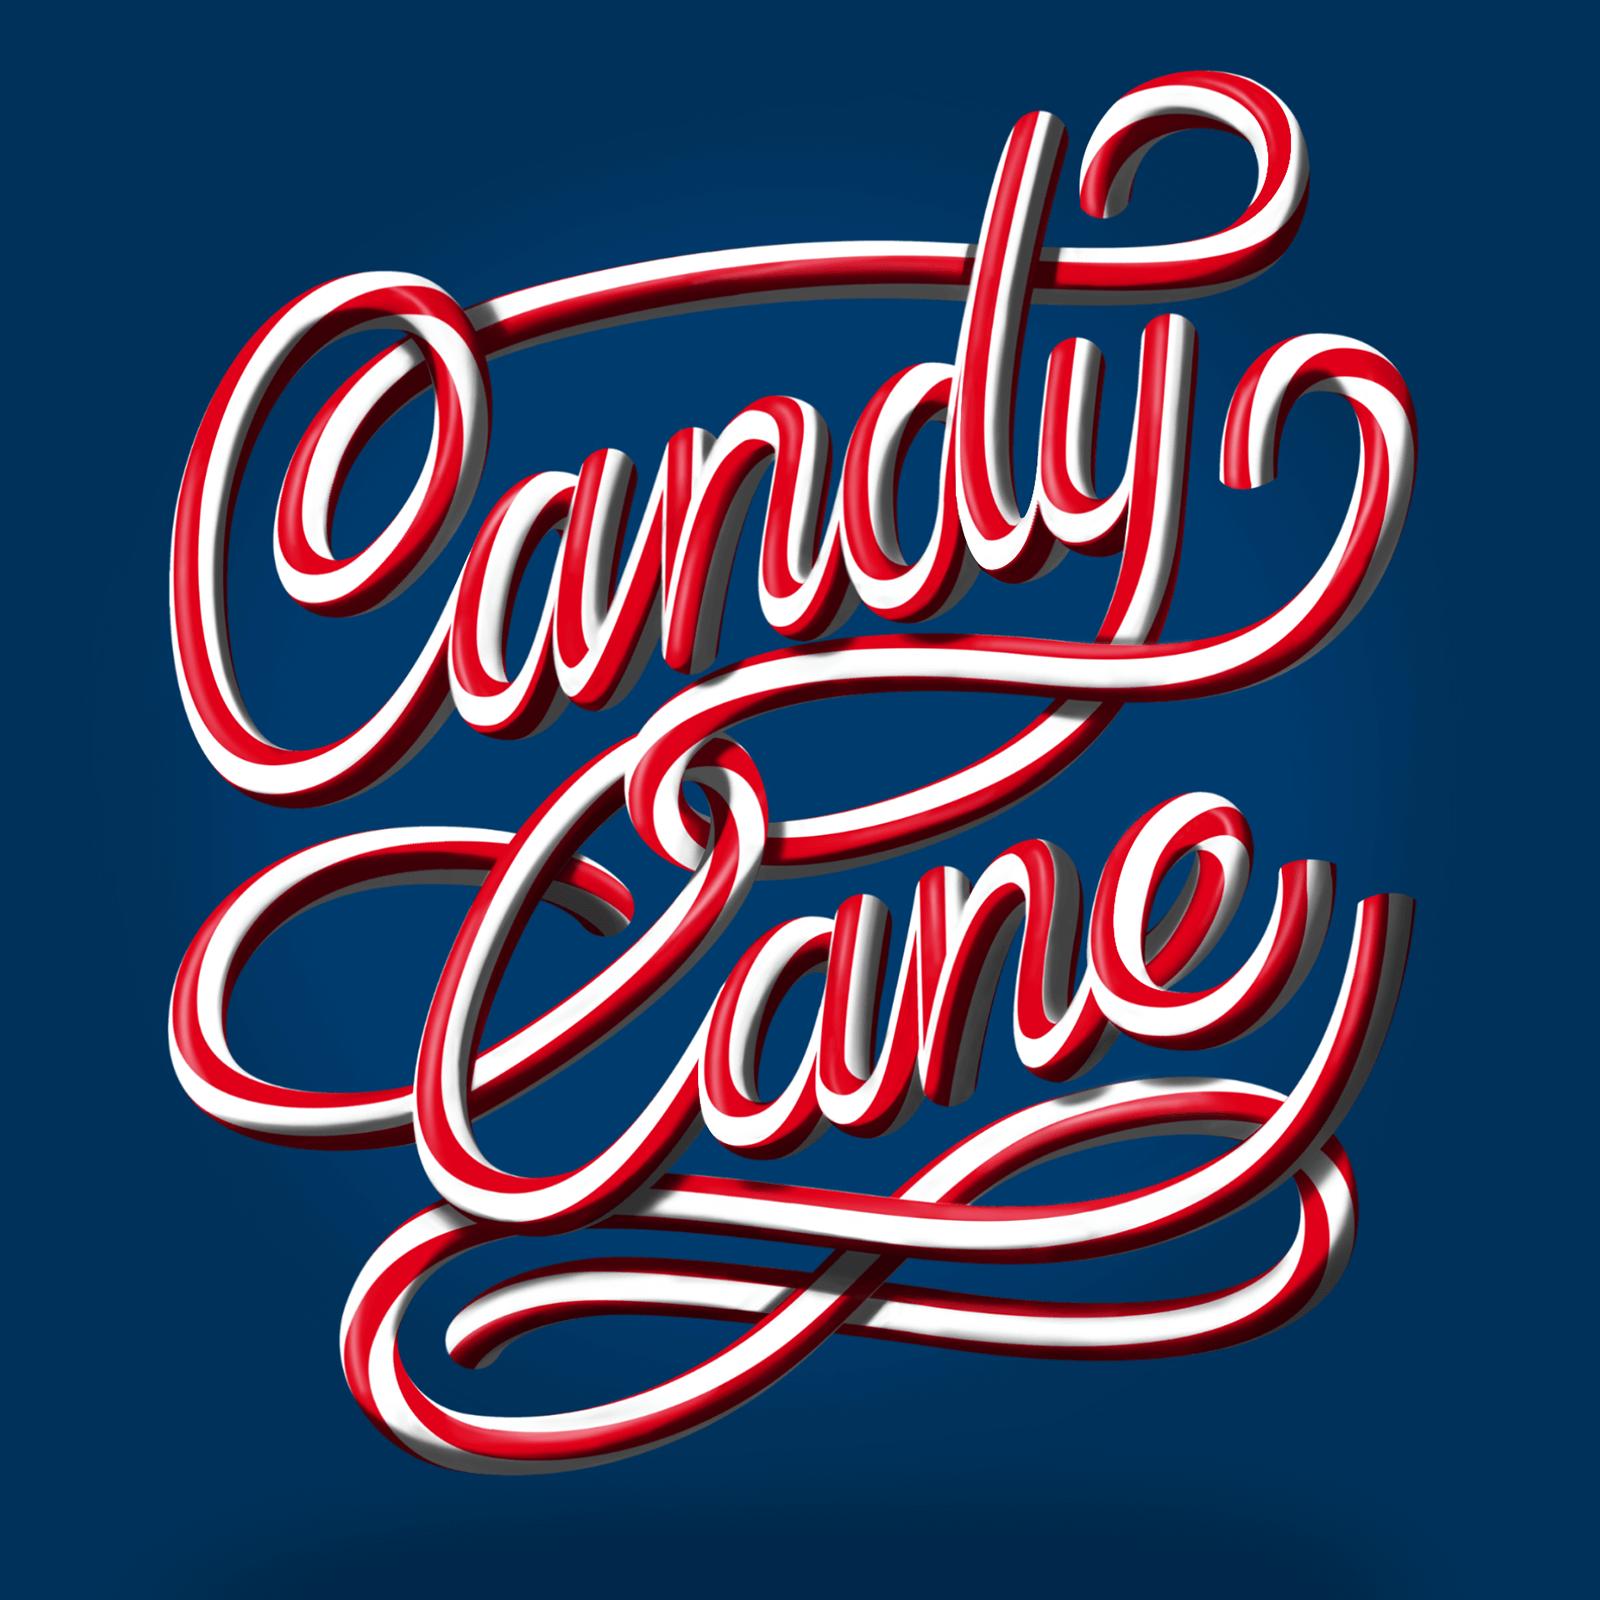 Candy Cane - Katharina Maya Mair